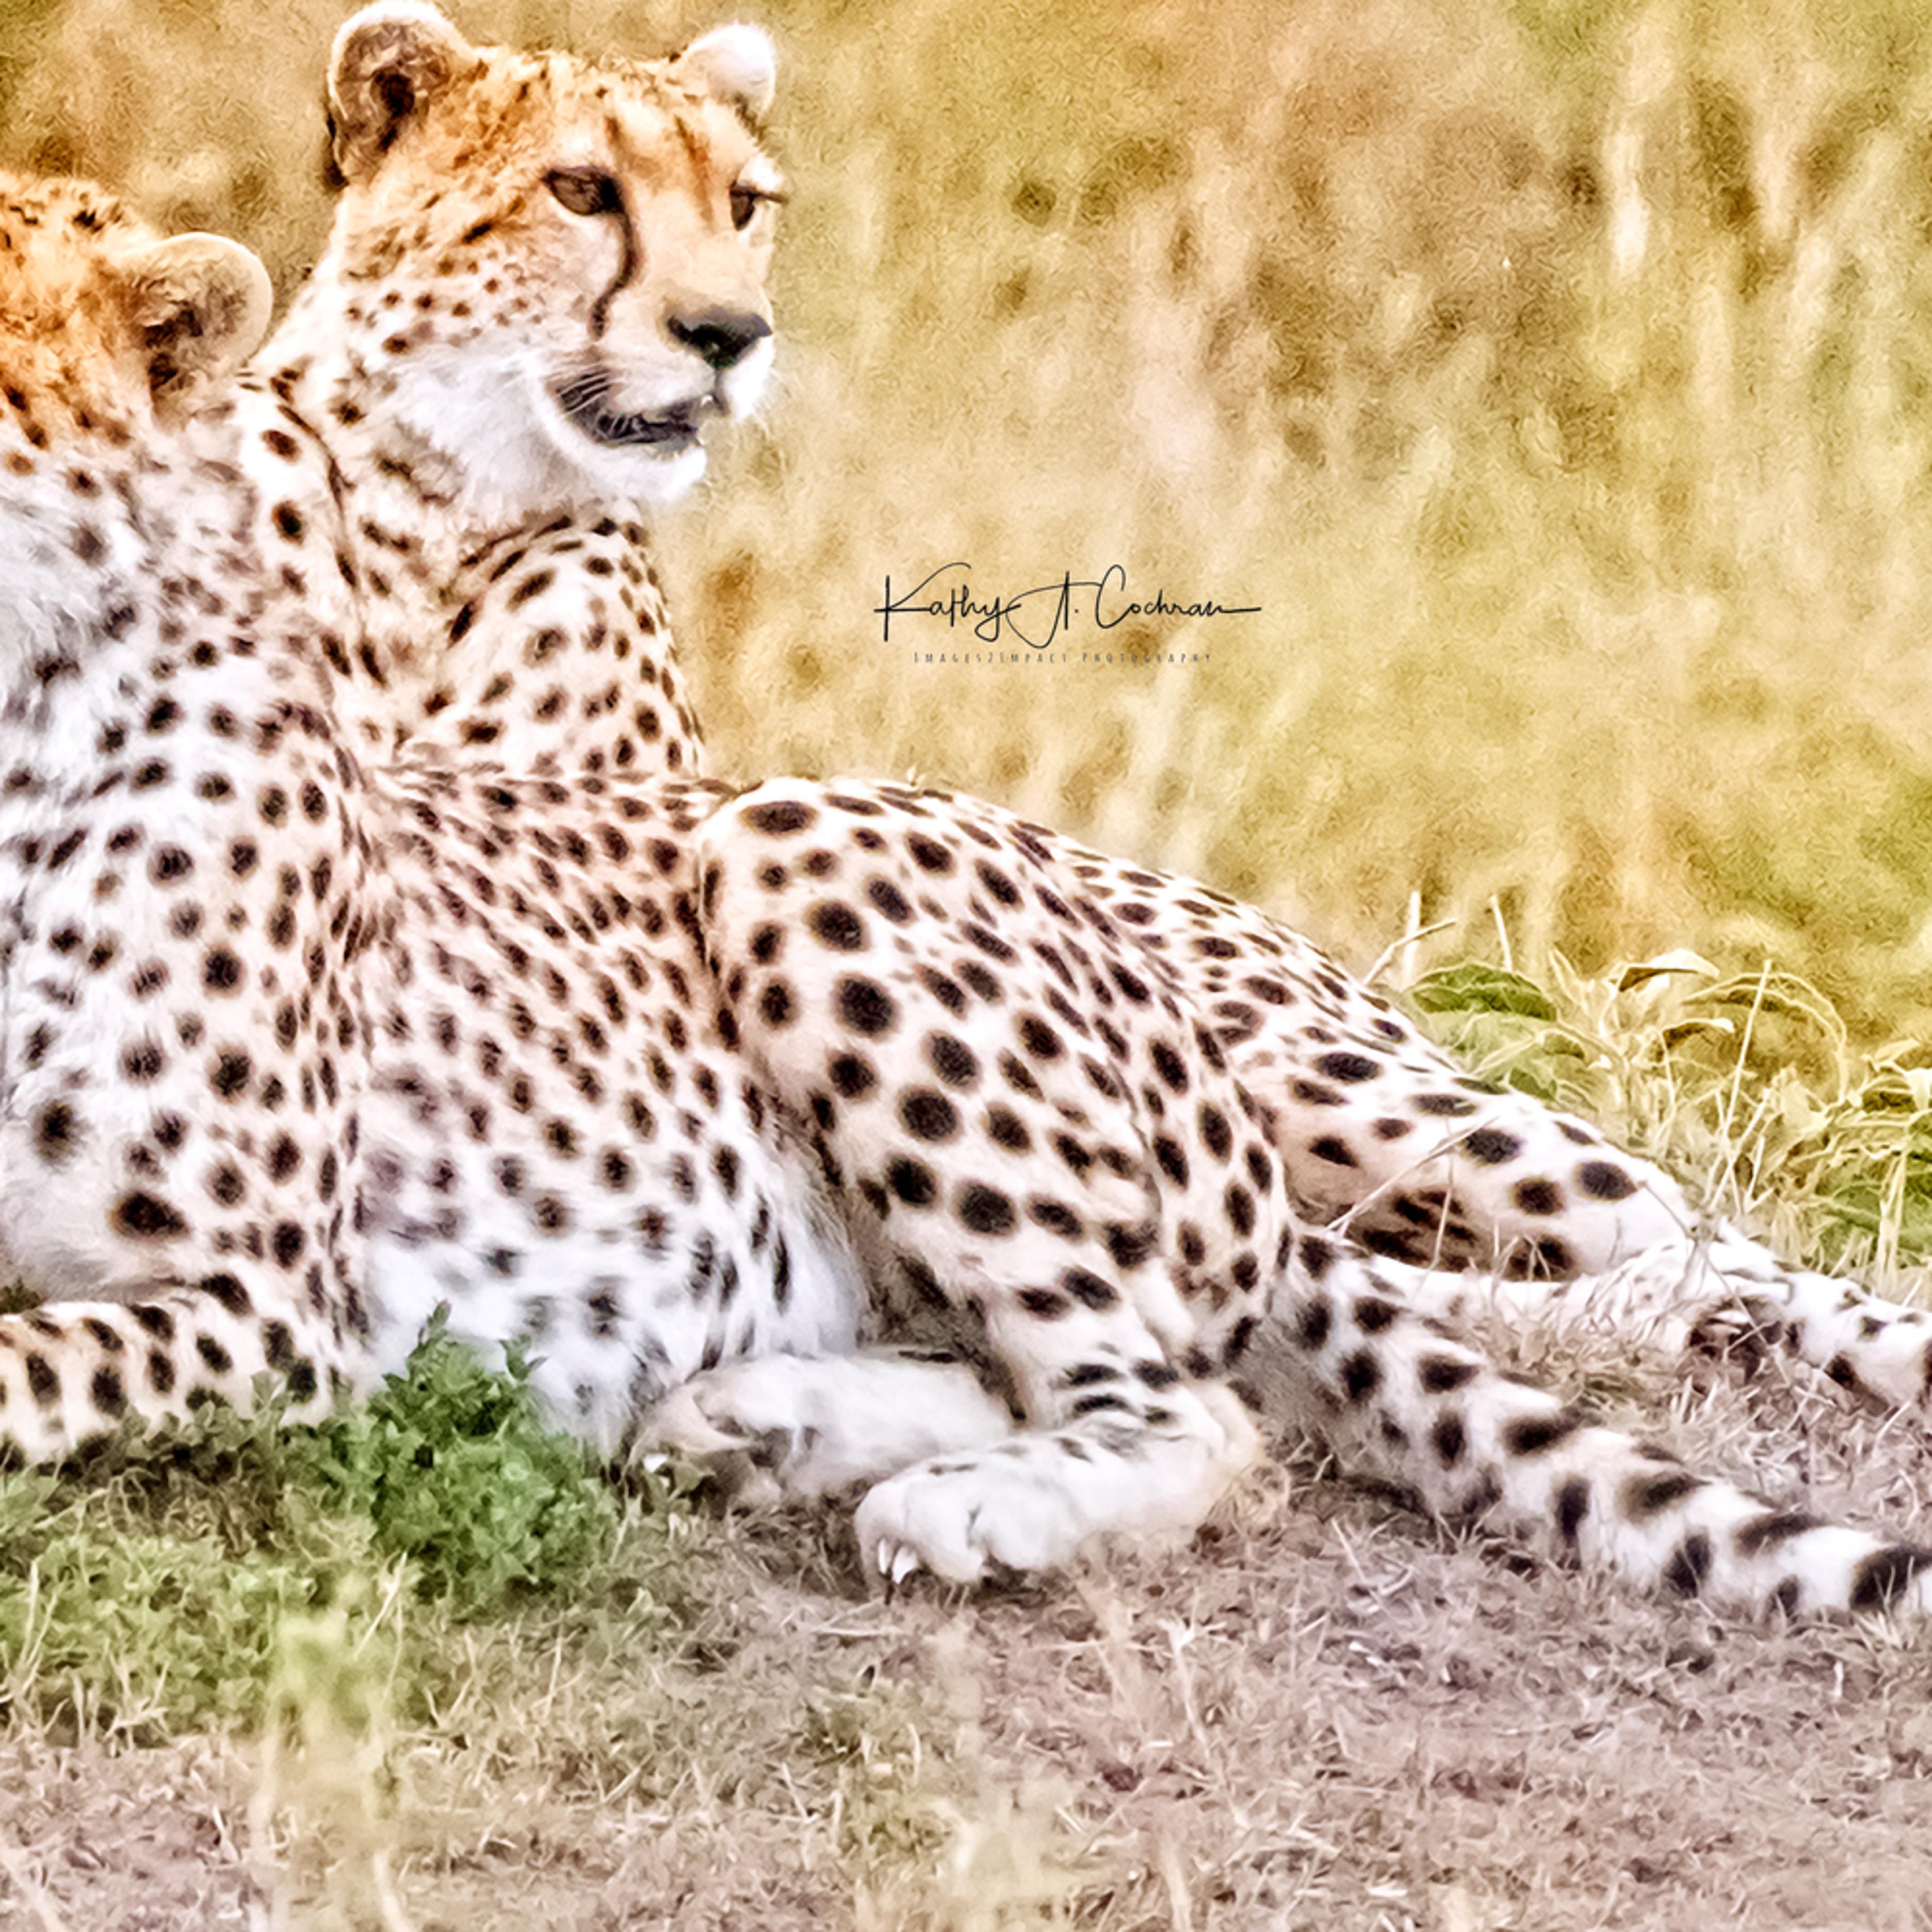 Cheetah brothers zawvfb